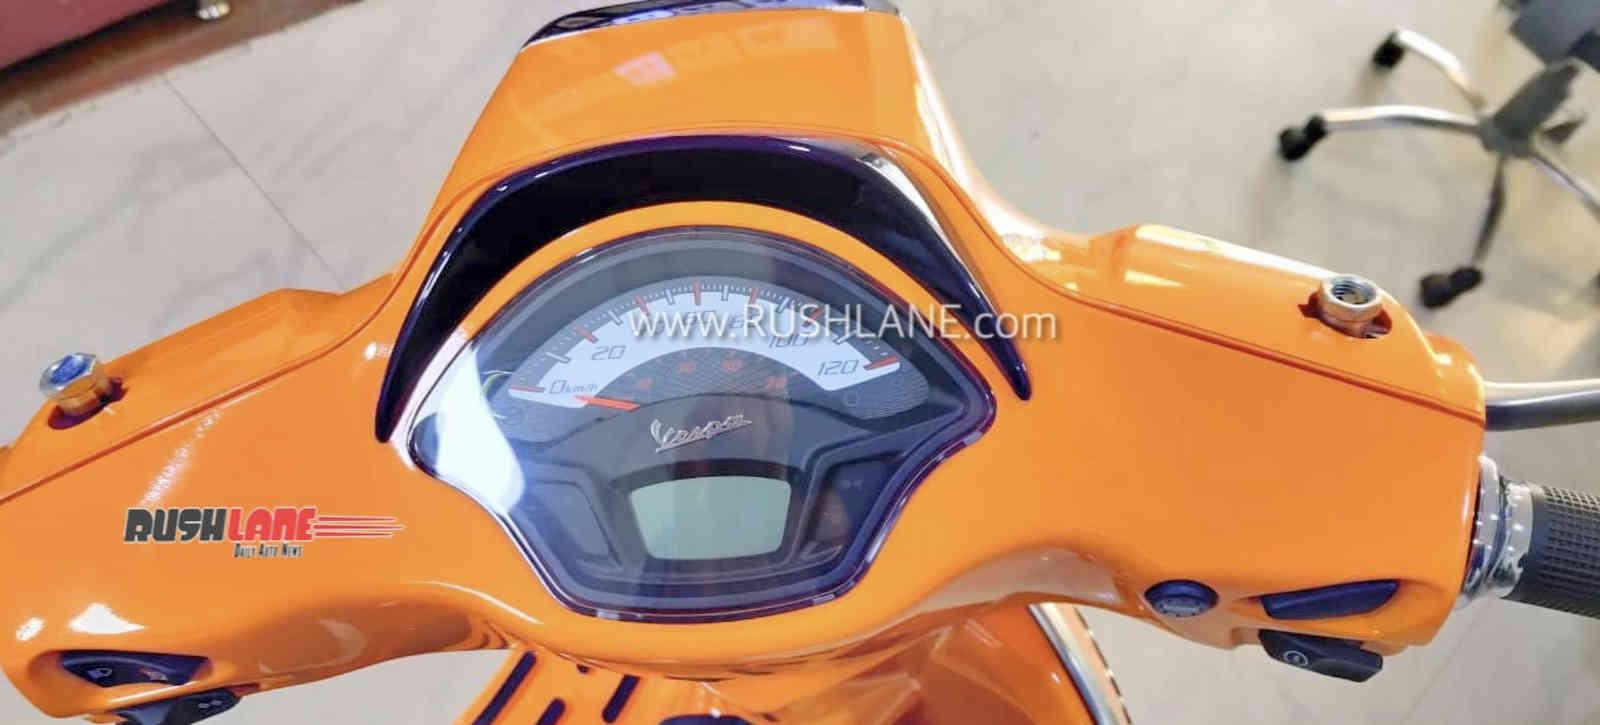 Vespa BS6 scooter